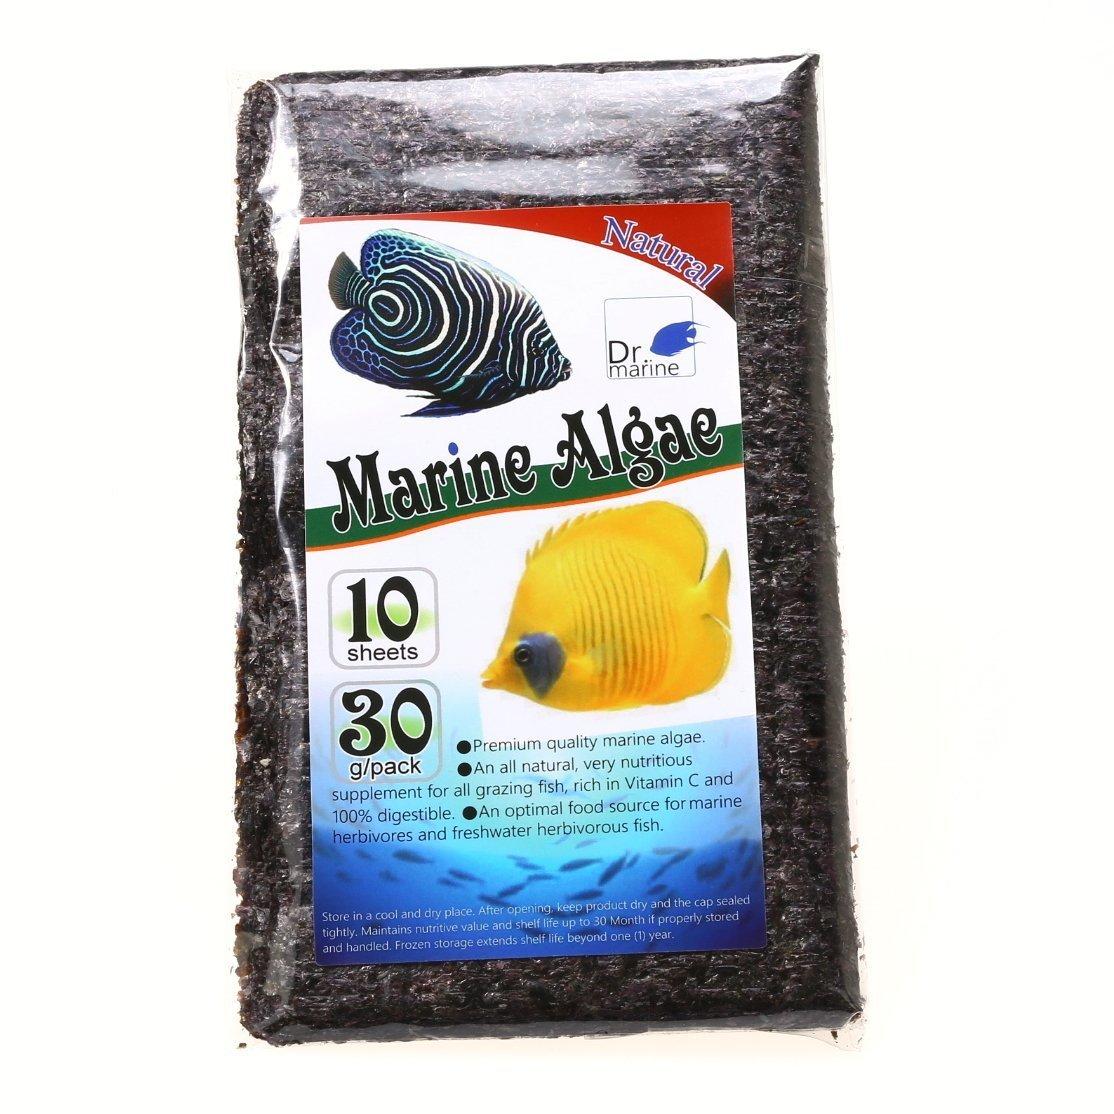 Dr. marine 10 Sheets Marine Algae 30g Seaweed Reef Fish Tank Food Feed Green Seaweed